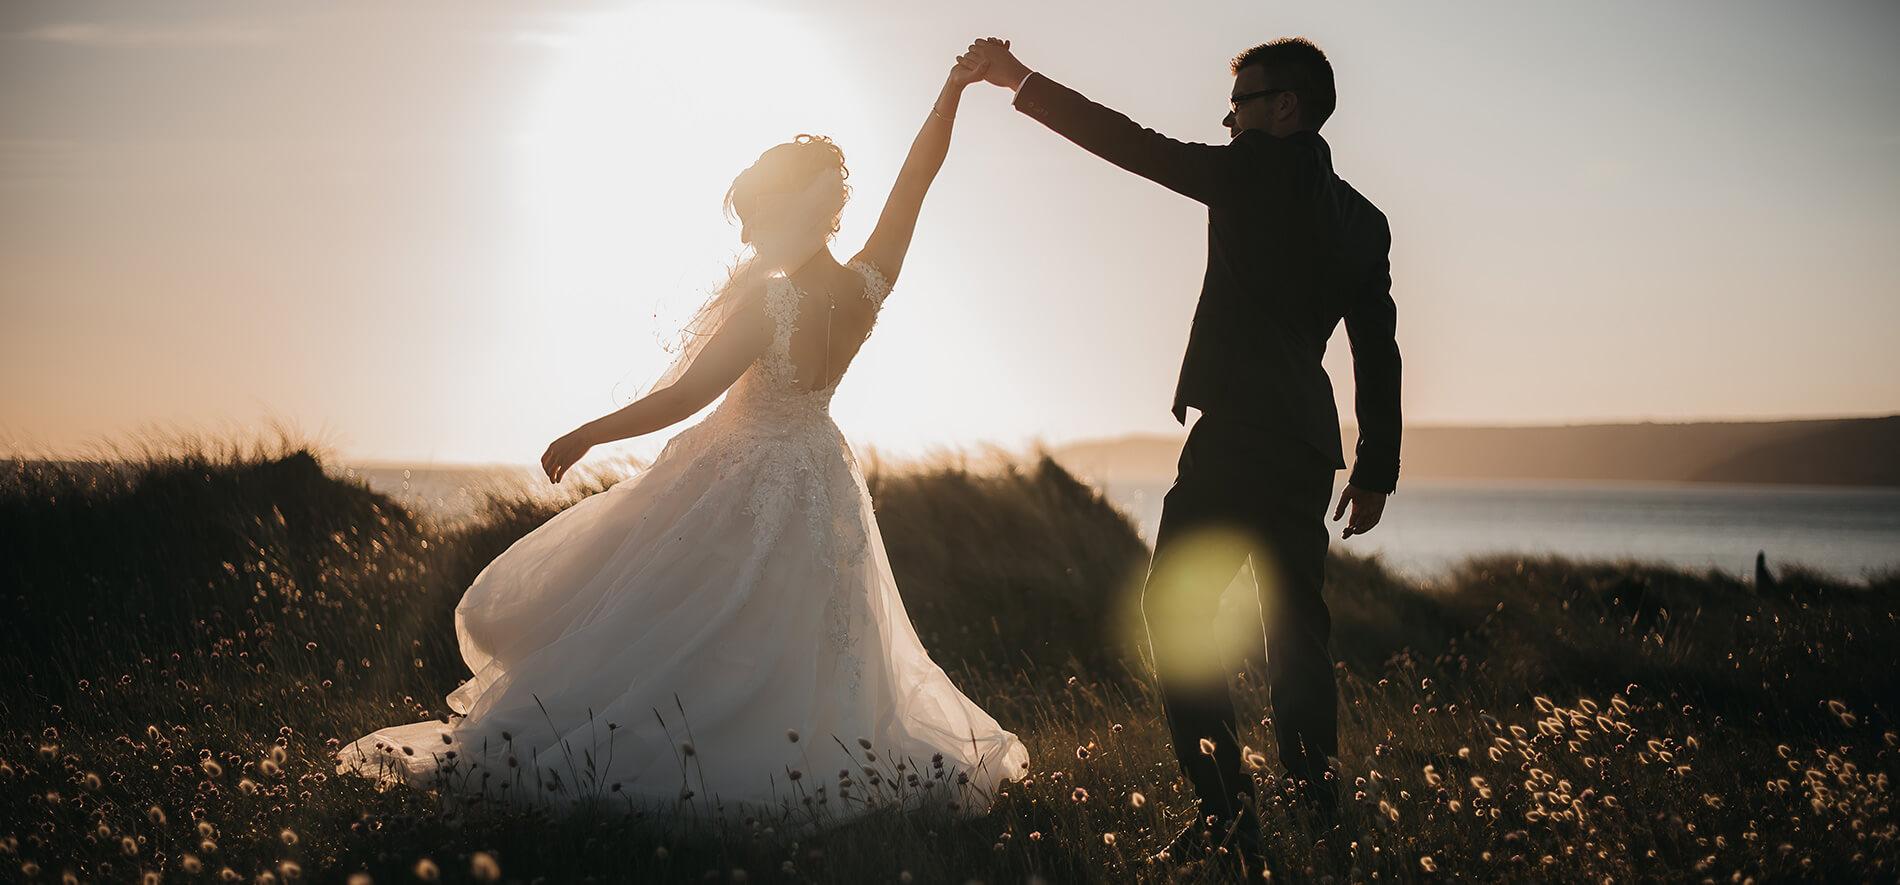 photographe de mariage moody